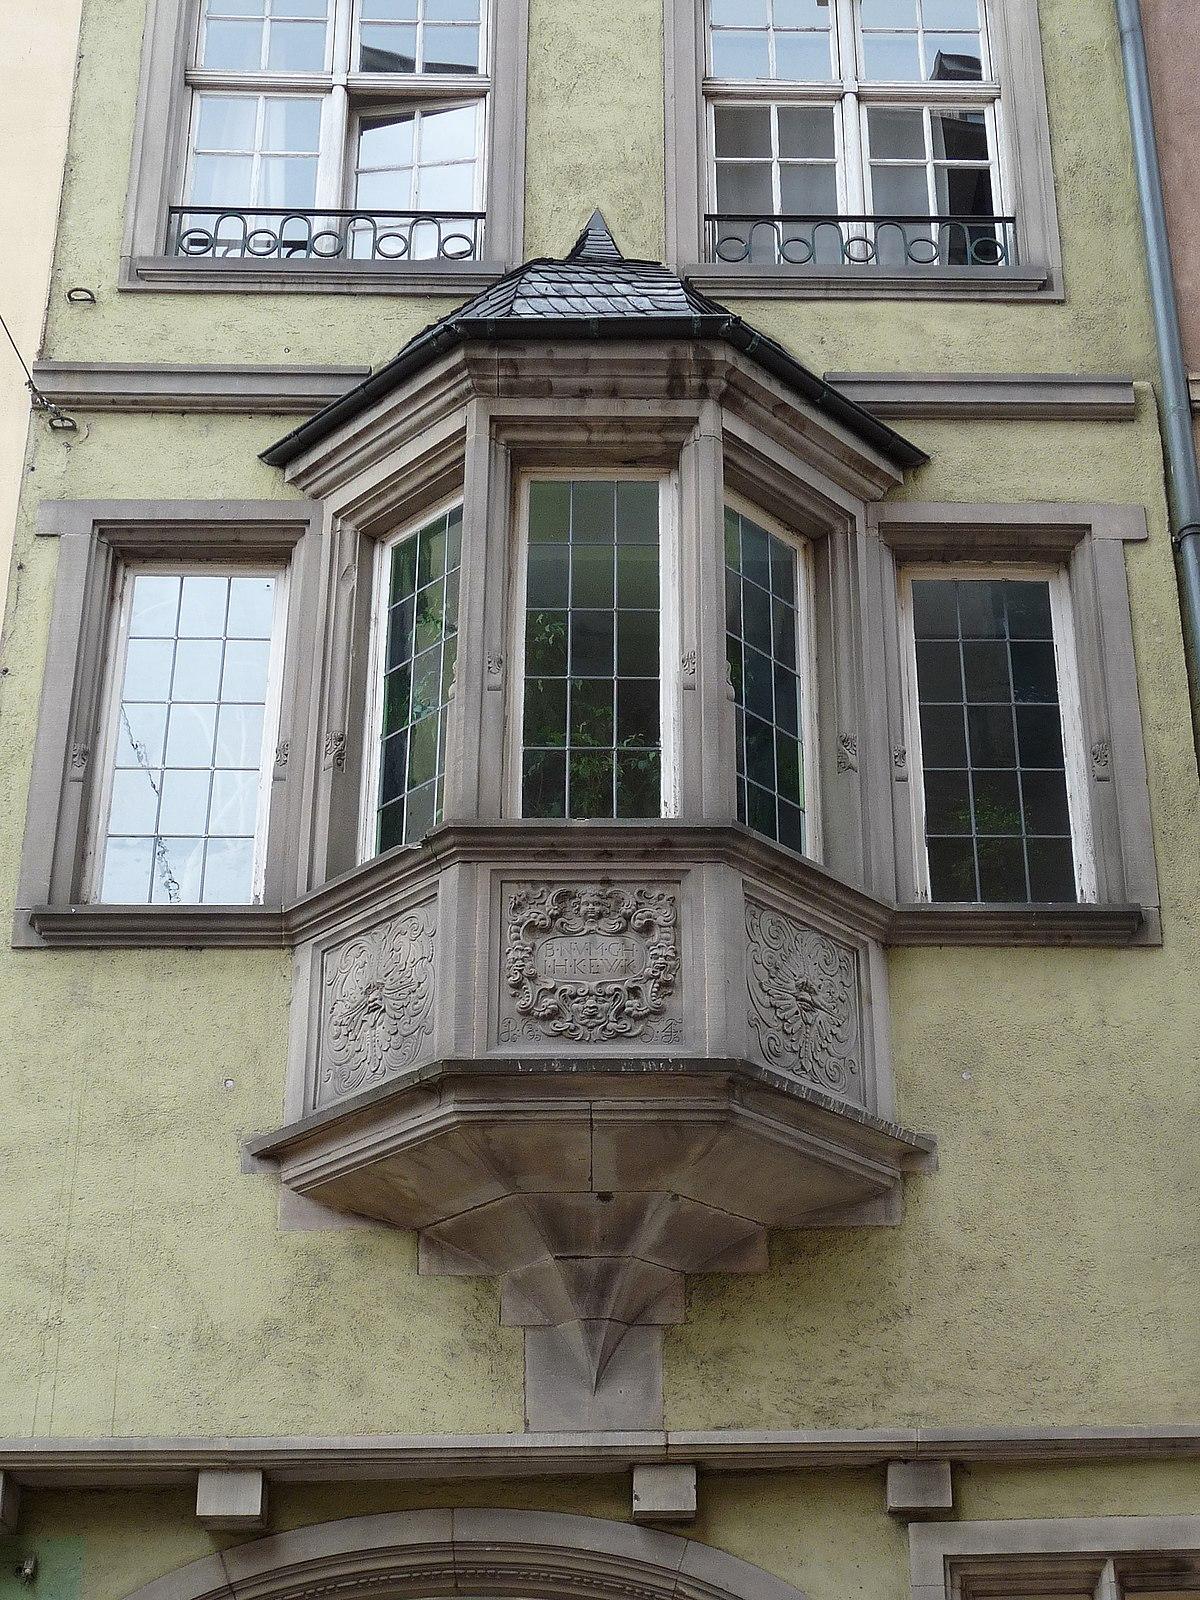 Maison au 5 rue des hallebardes strasbourg wikip dia for Maison avec bow window